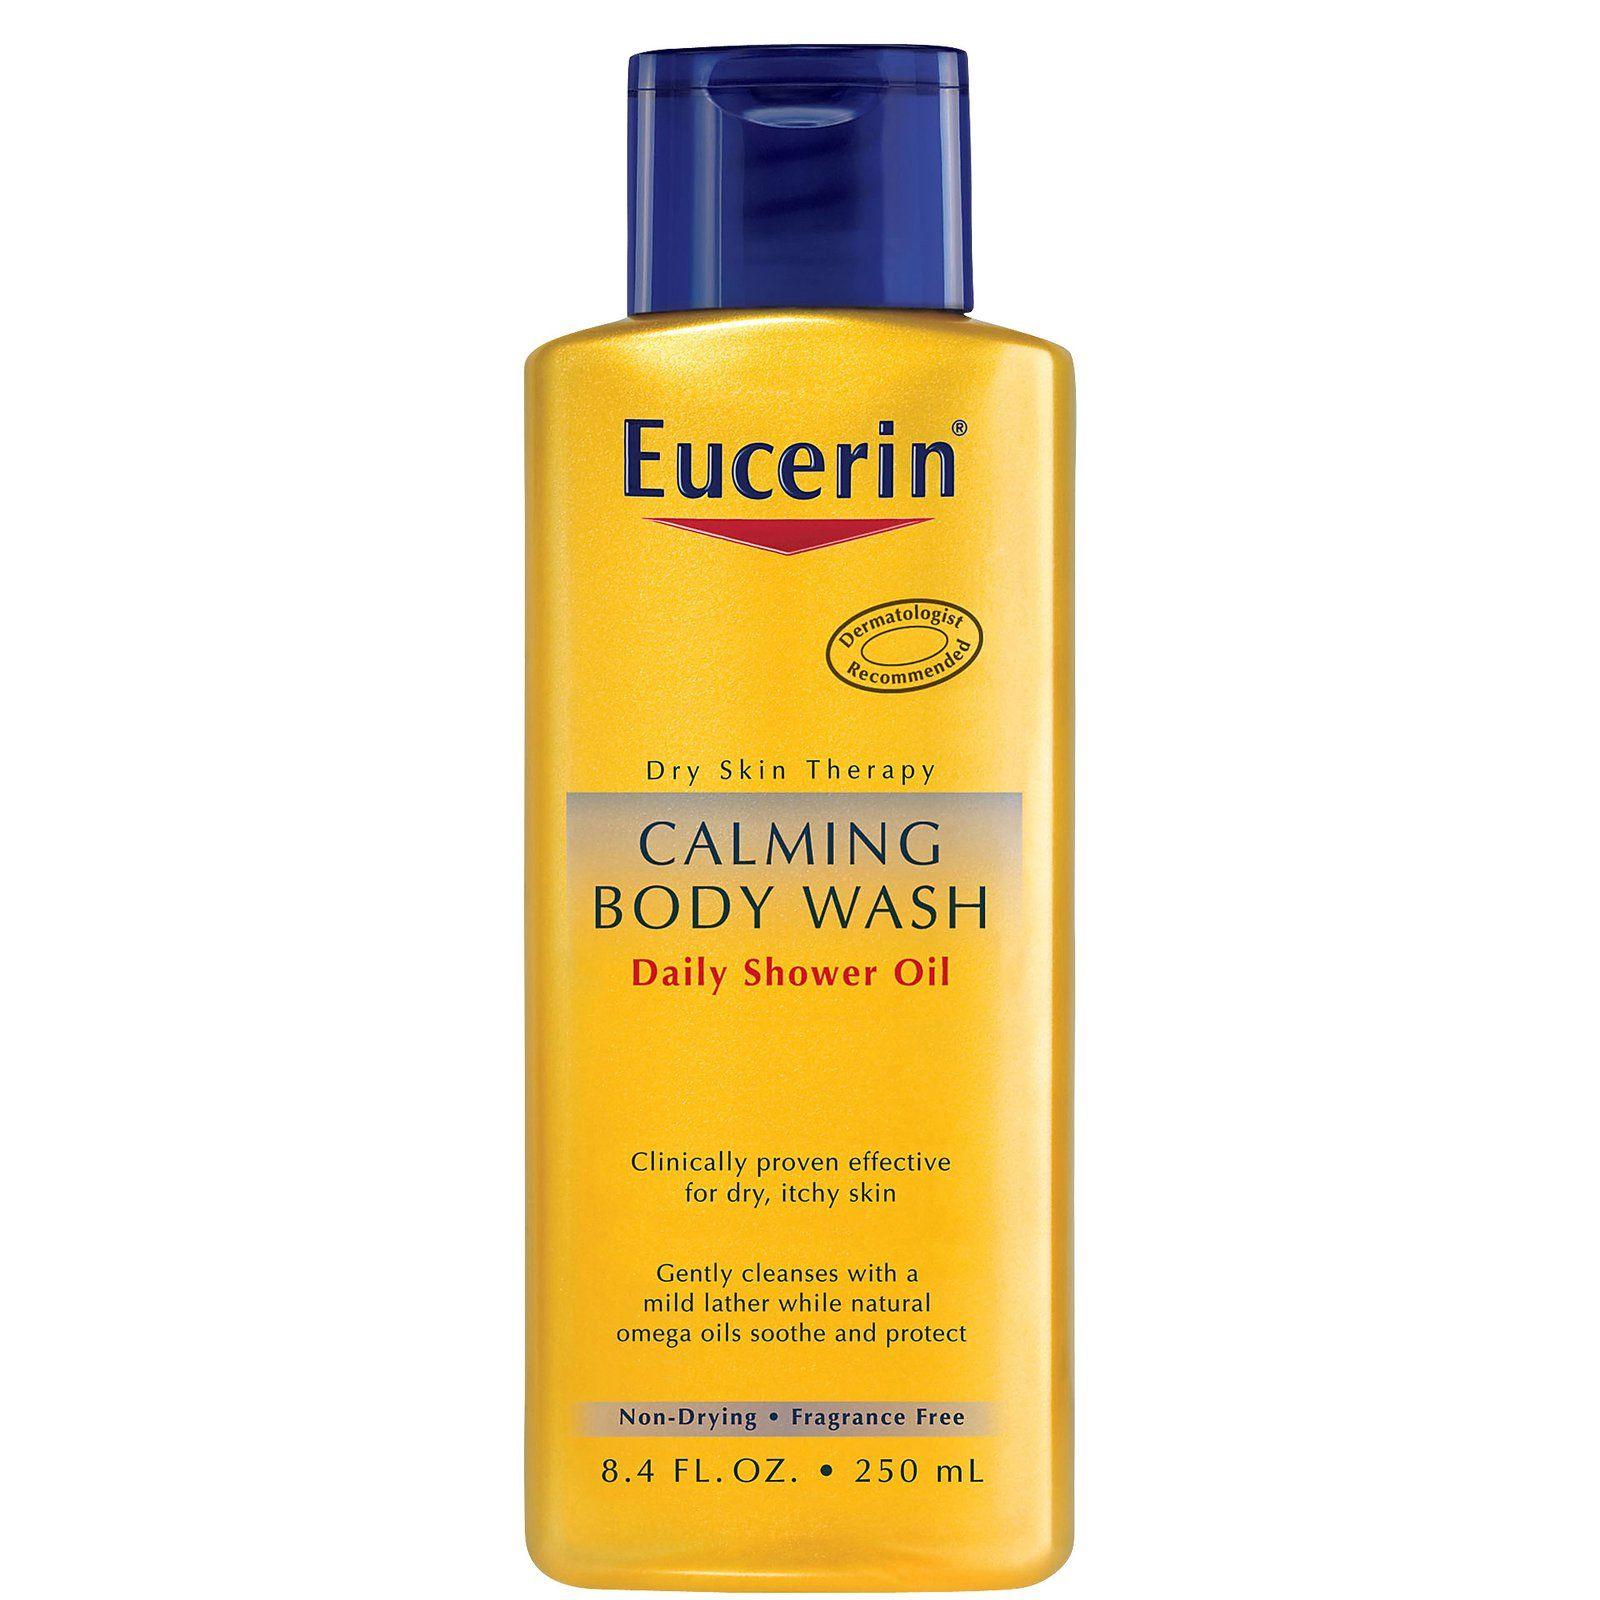 Eucerin Calming Urea Shampoo 250ml Eboots Uk Beauty Health Eucerin Shampoo